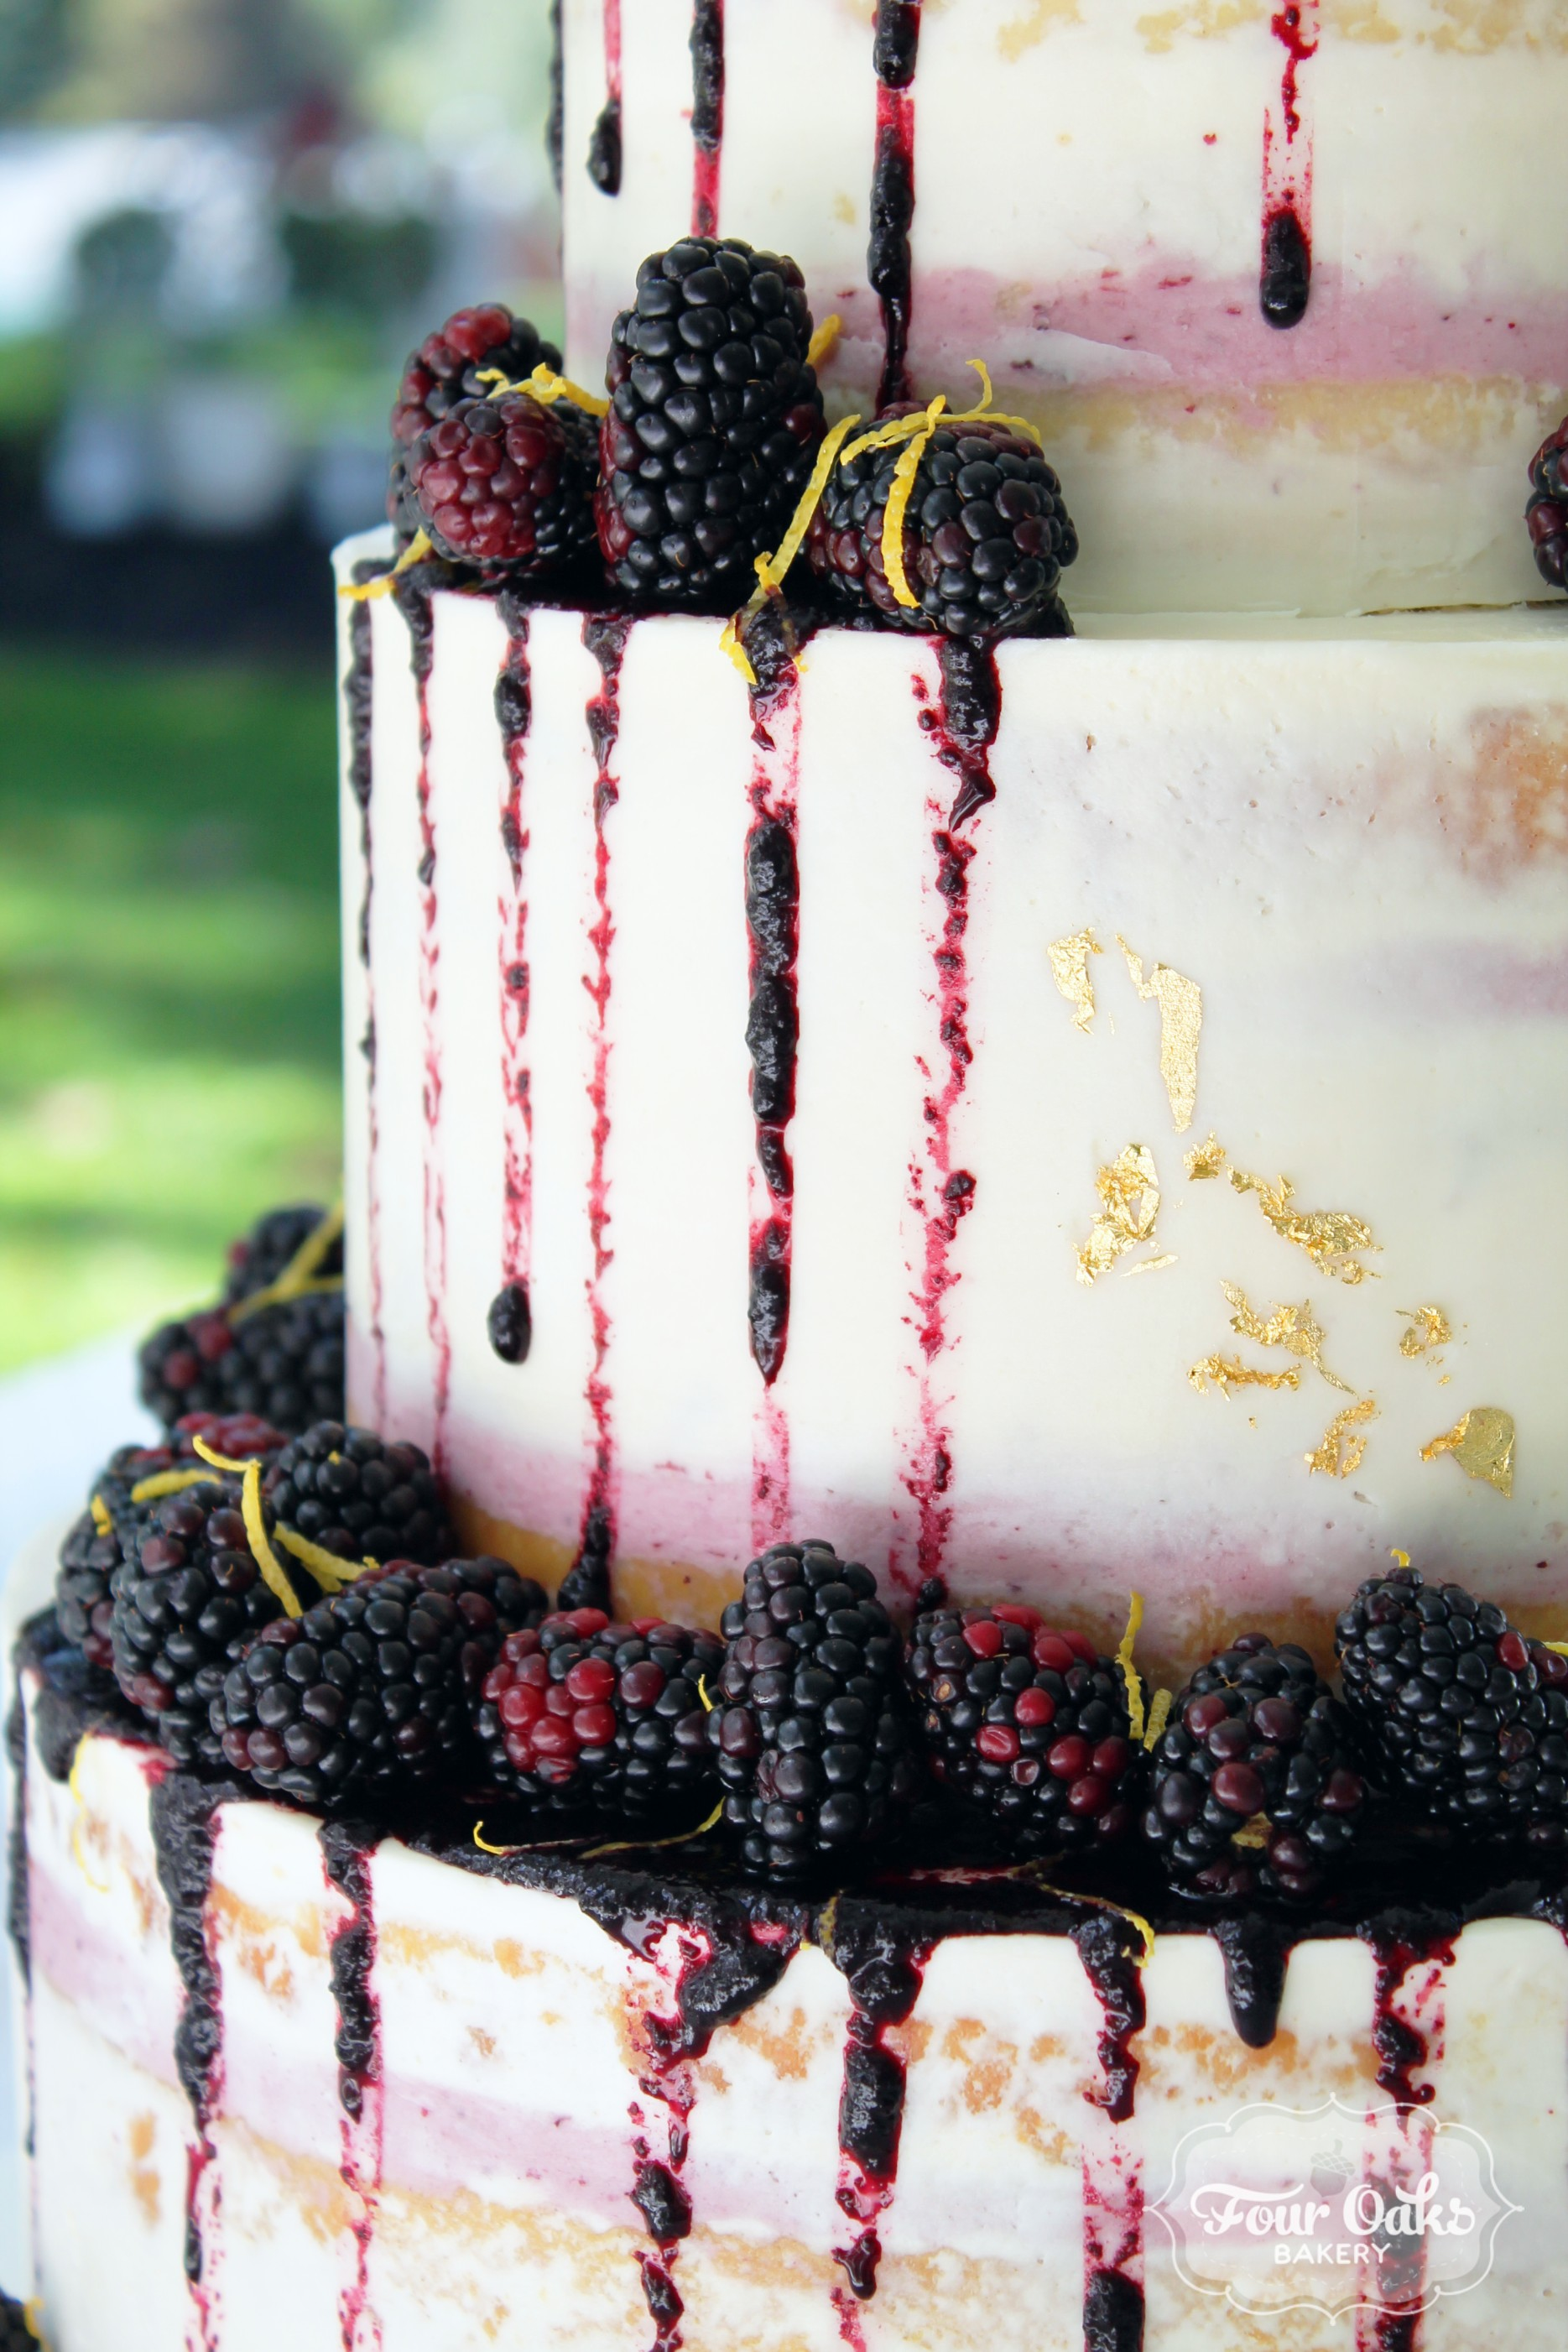 Lemon-Blackberry Semi-Naked Drip Wedding Cake in Delmont, PA